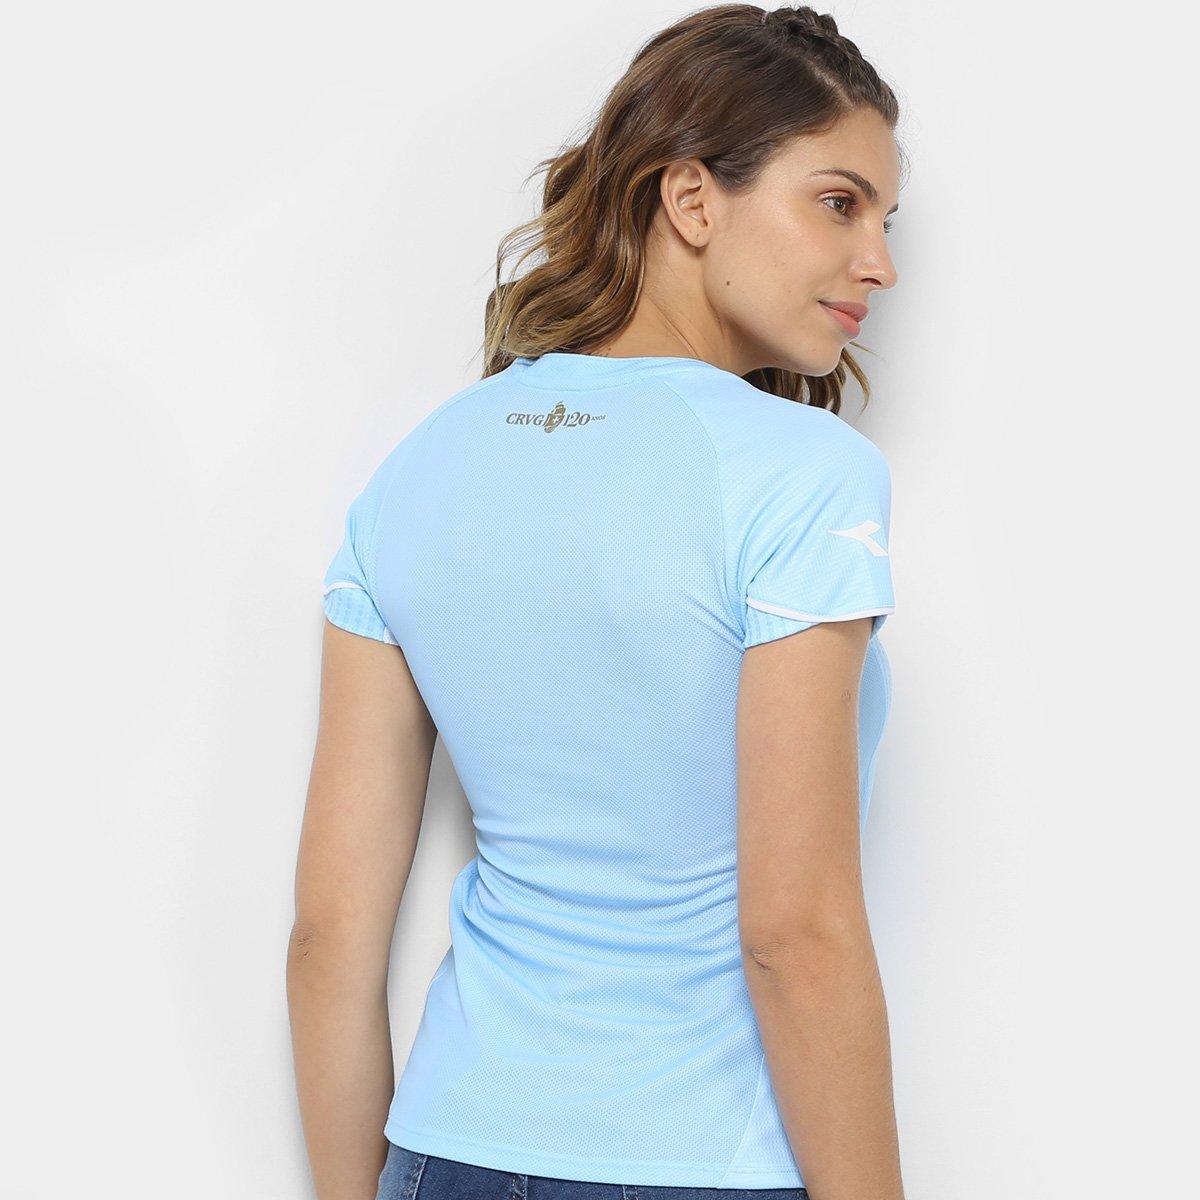 c10cca12f3 Camisa de Goleiro Vasco I 2018 s n° Torcedor Diadora Feminina - Azul ...